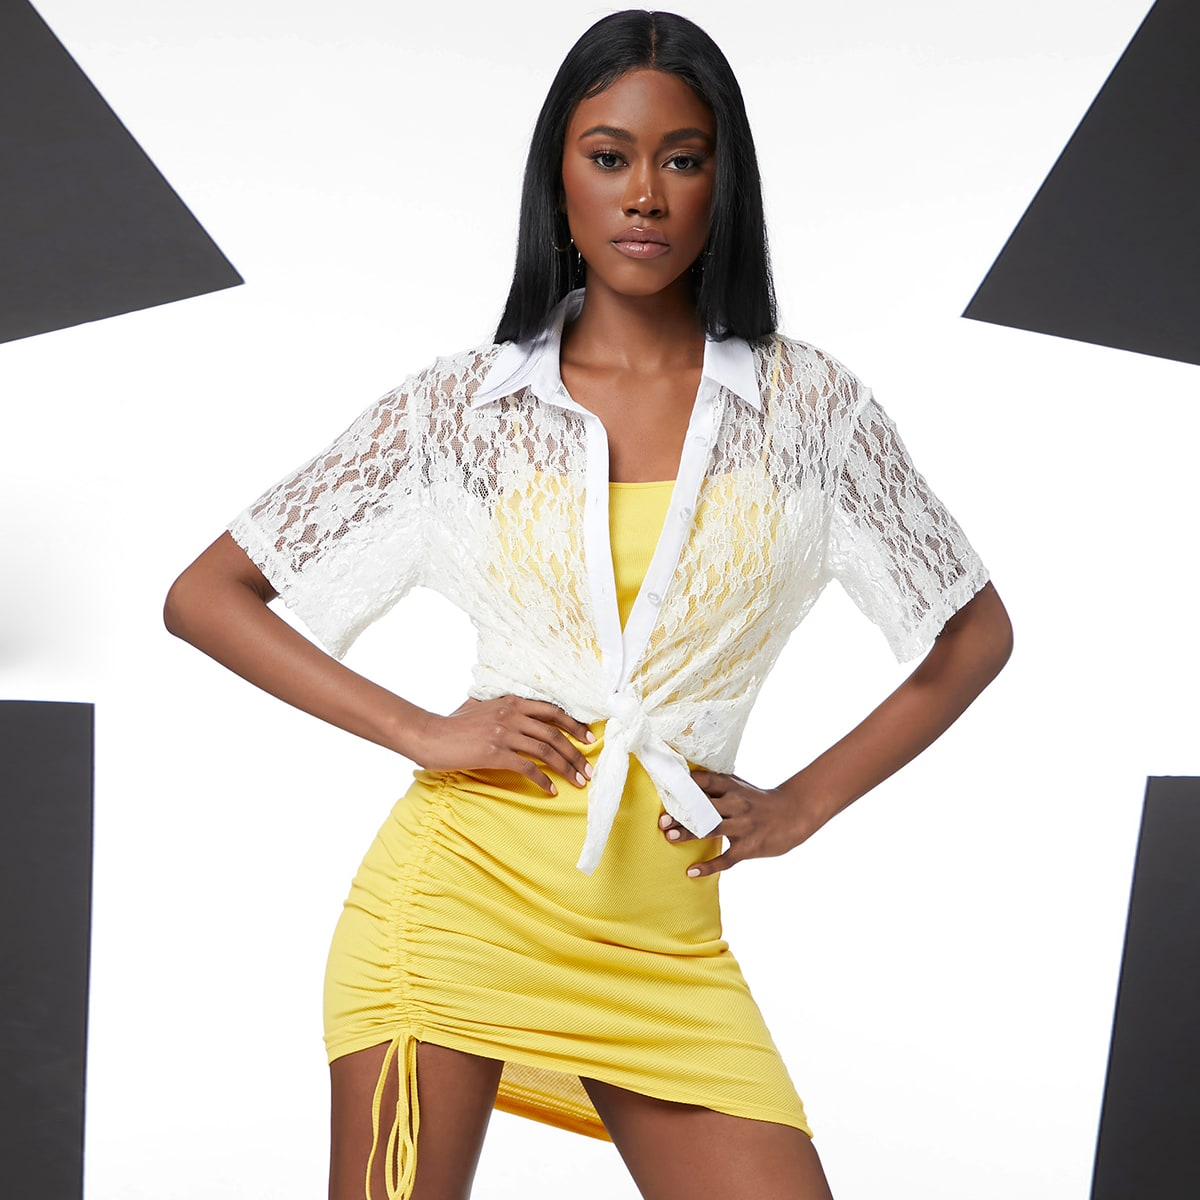 Кружевная блузка с разрезом по цене 610